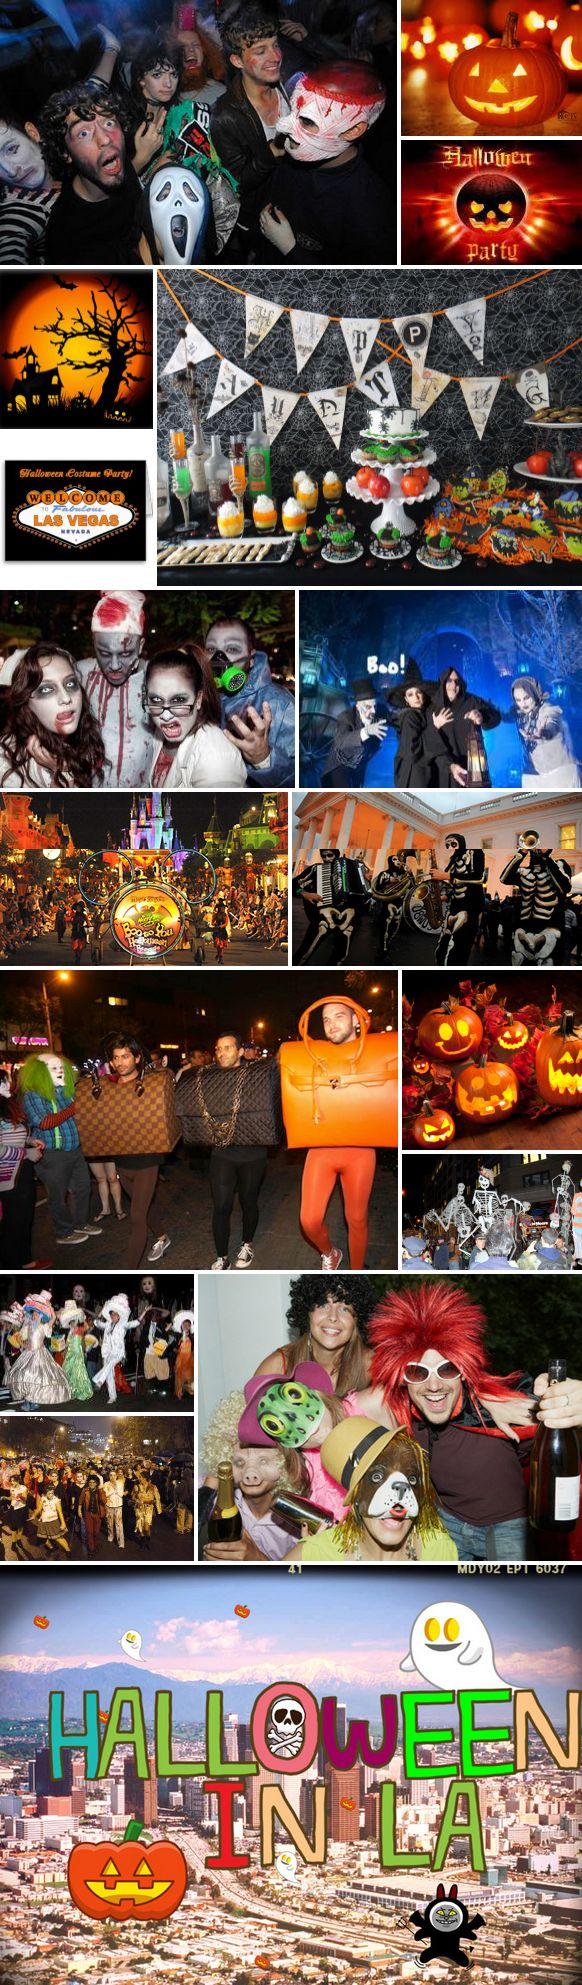 halloween events usa